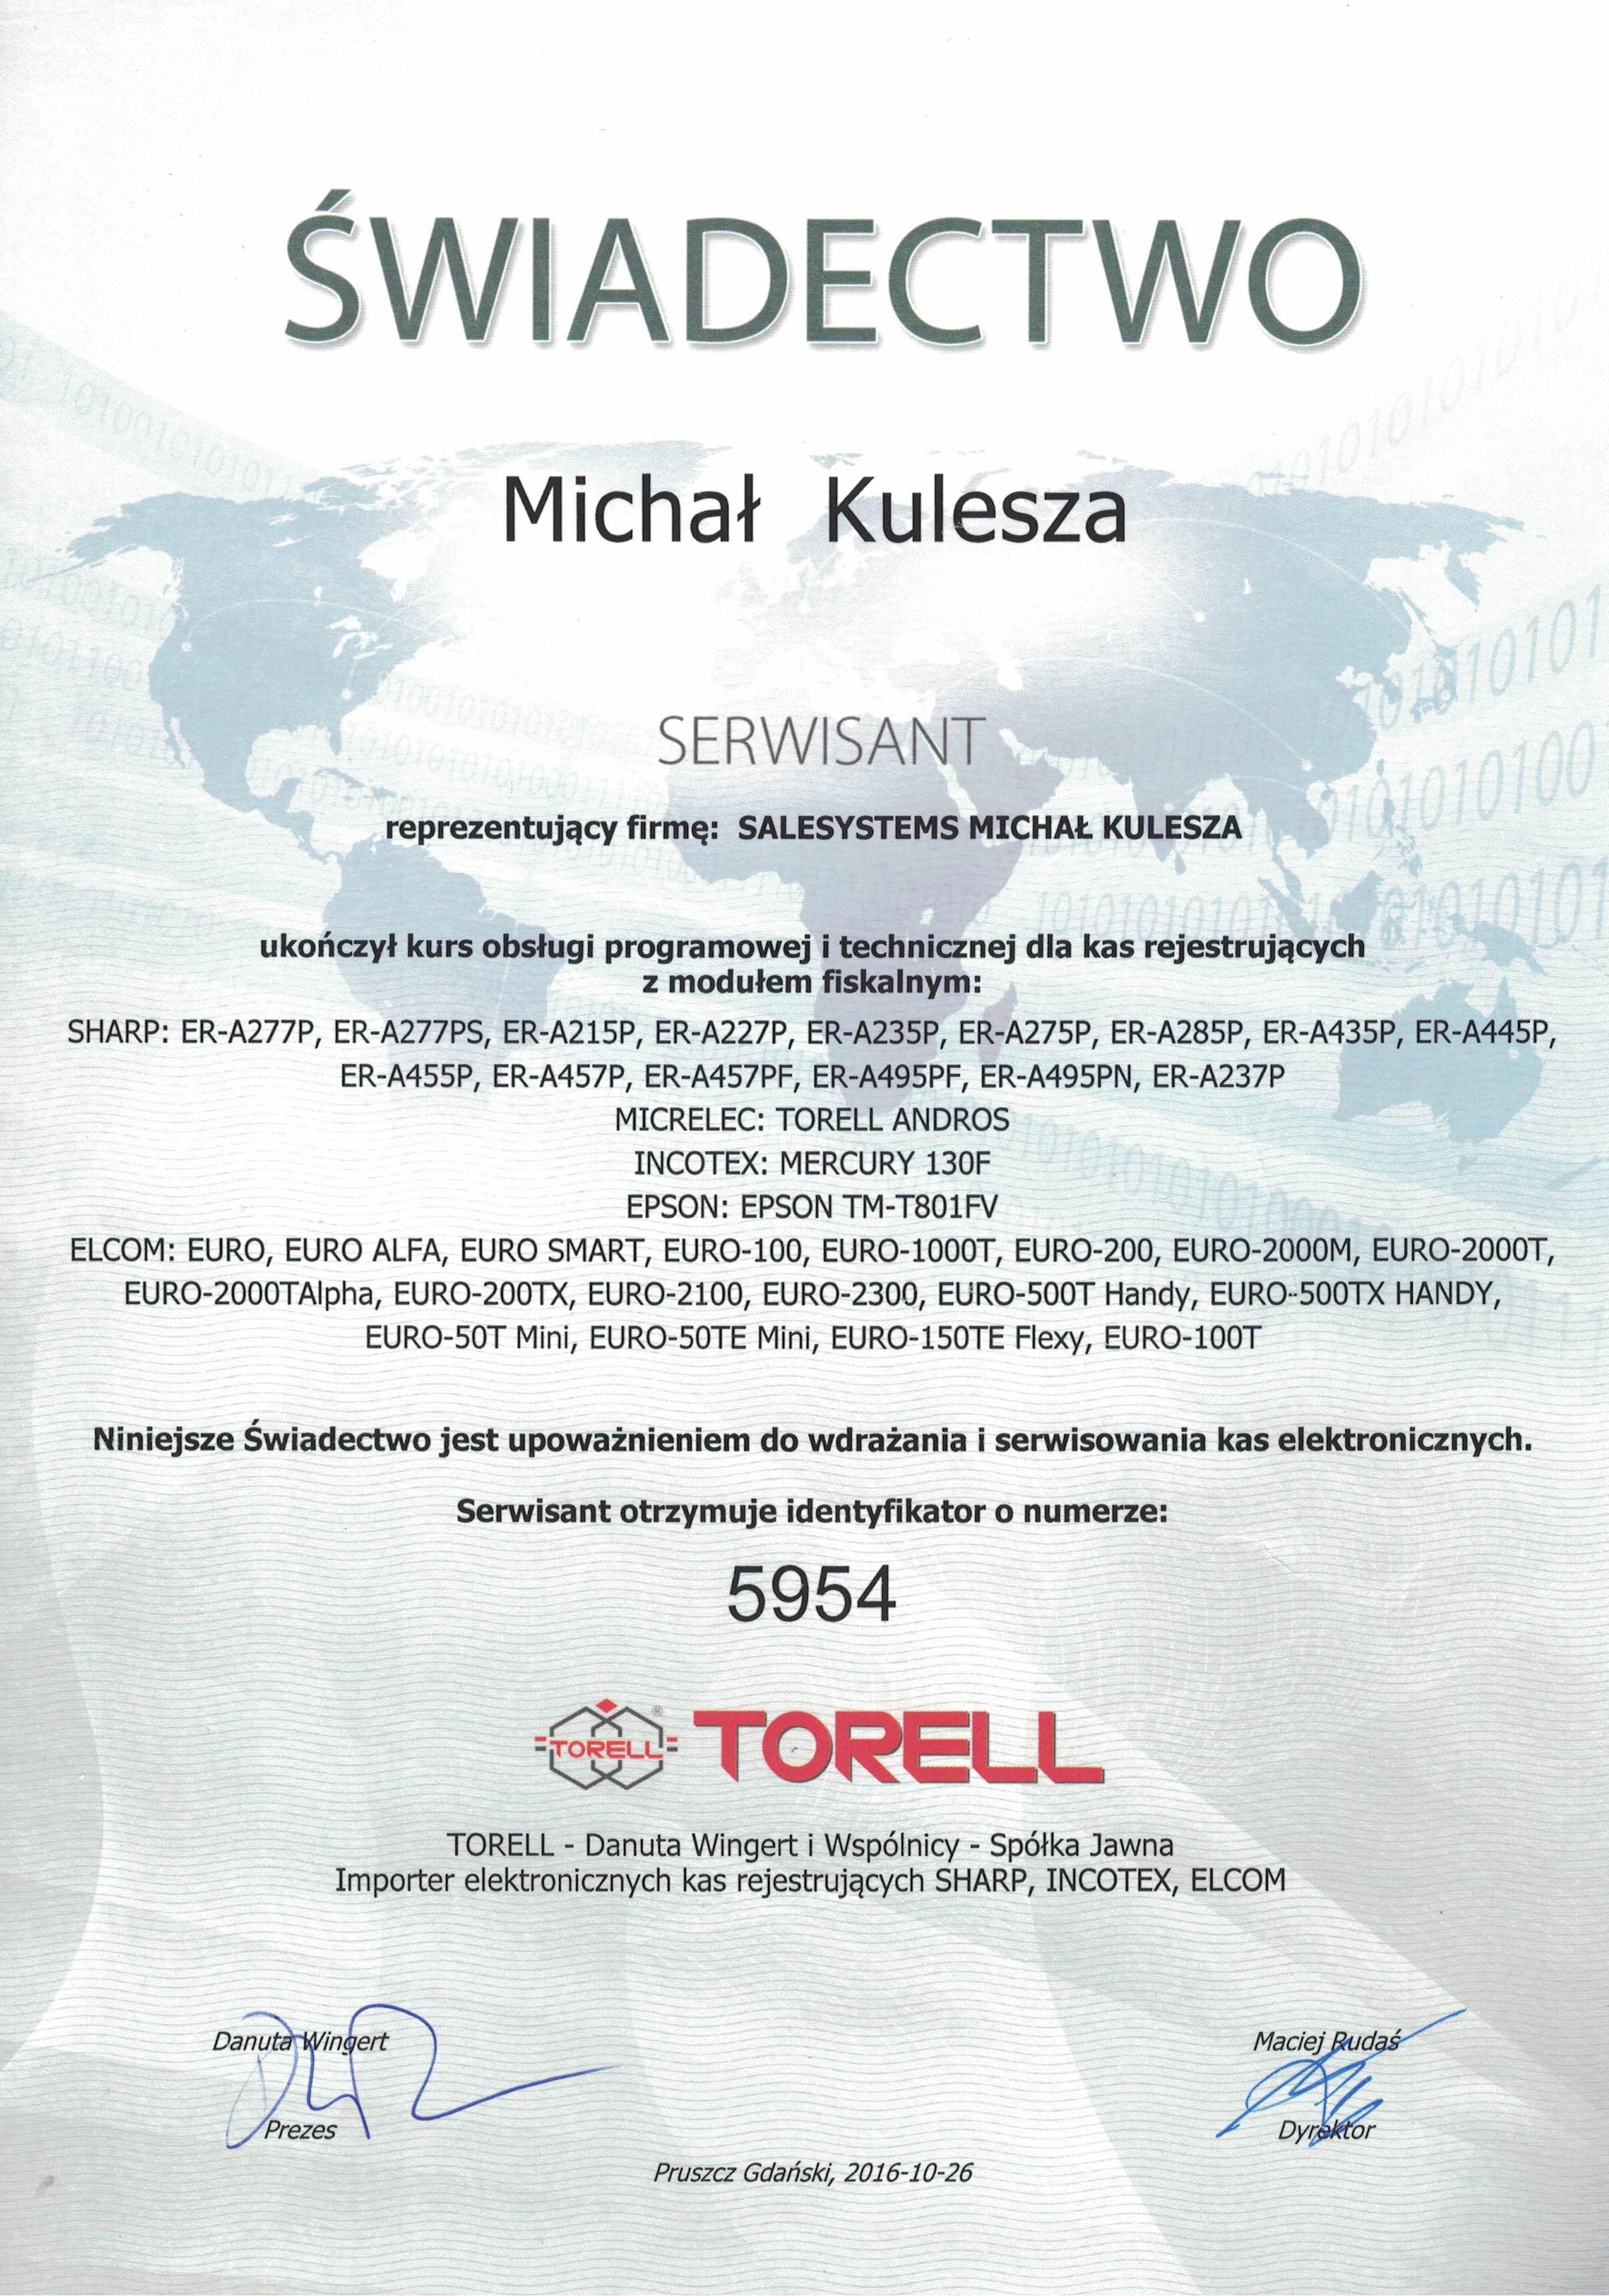 TORELL Certyfikat